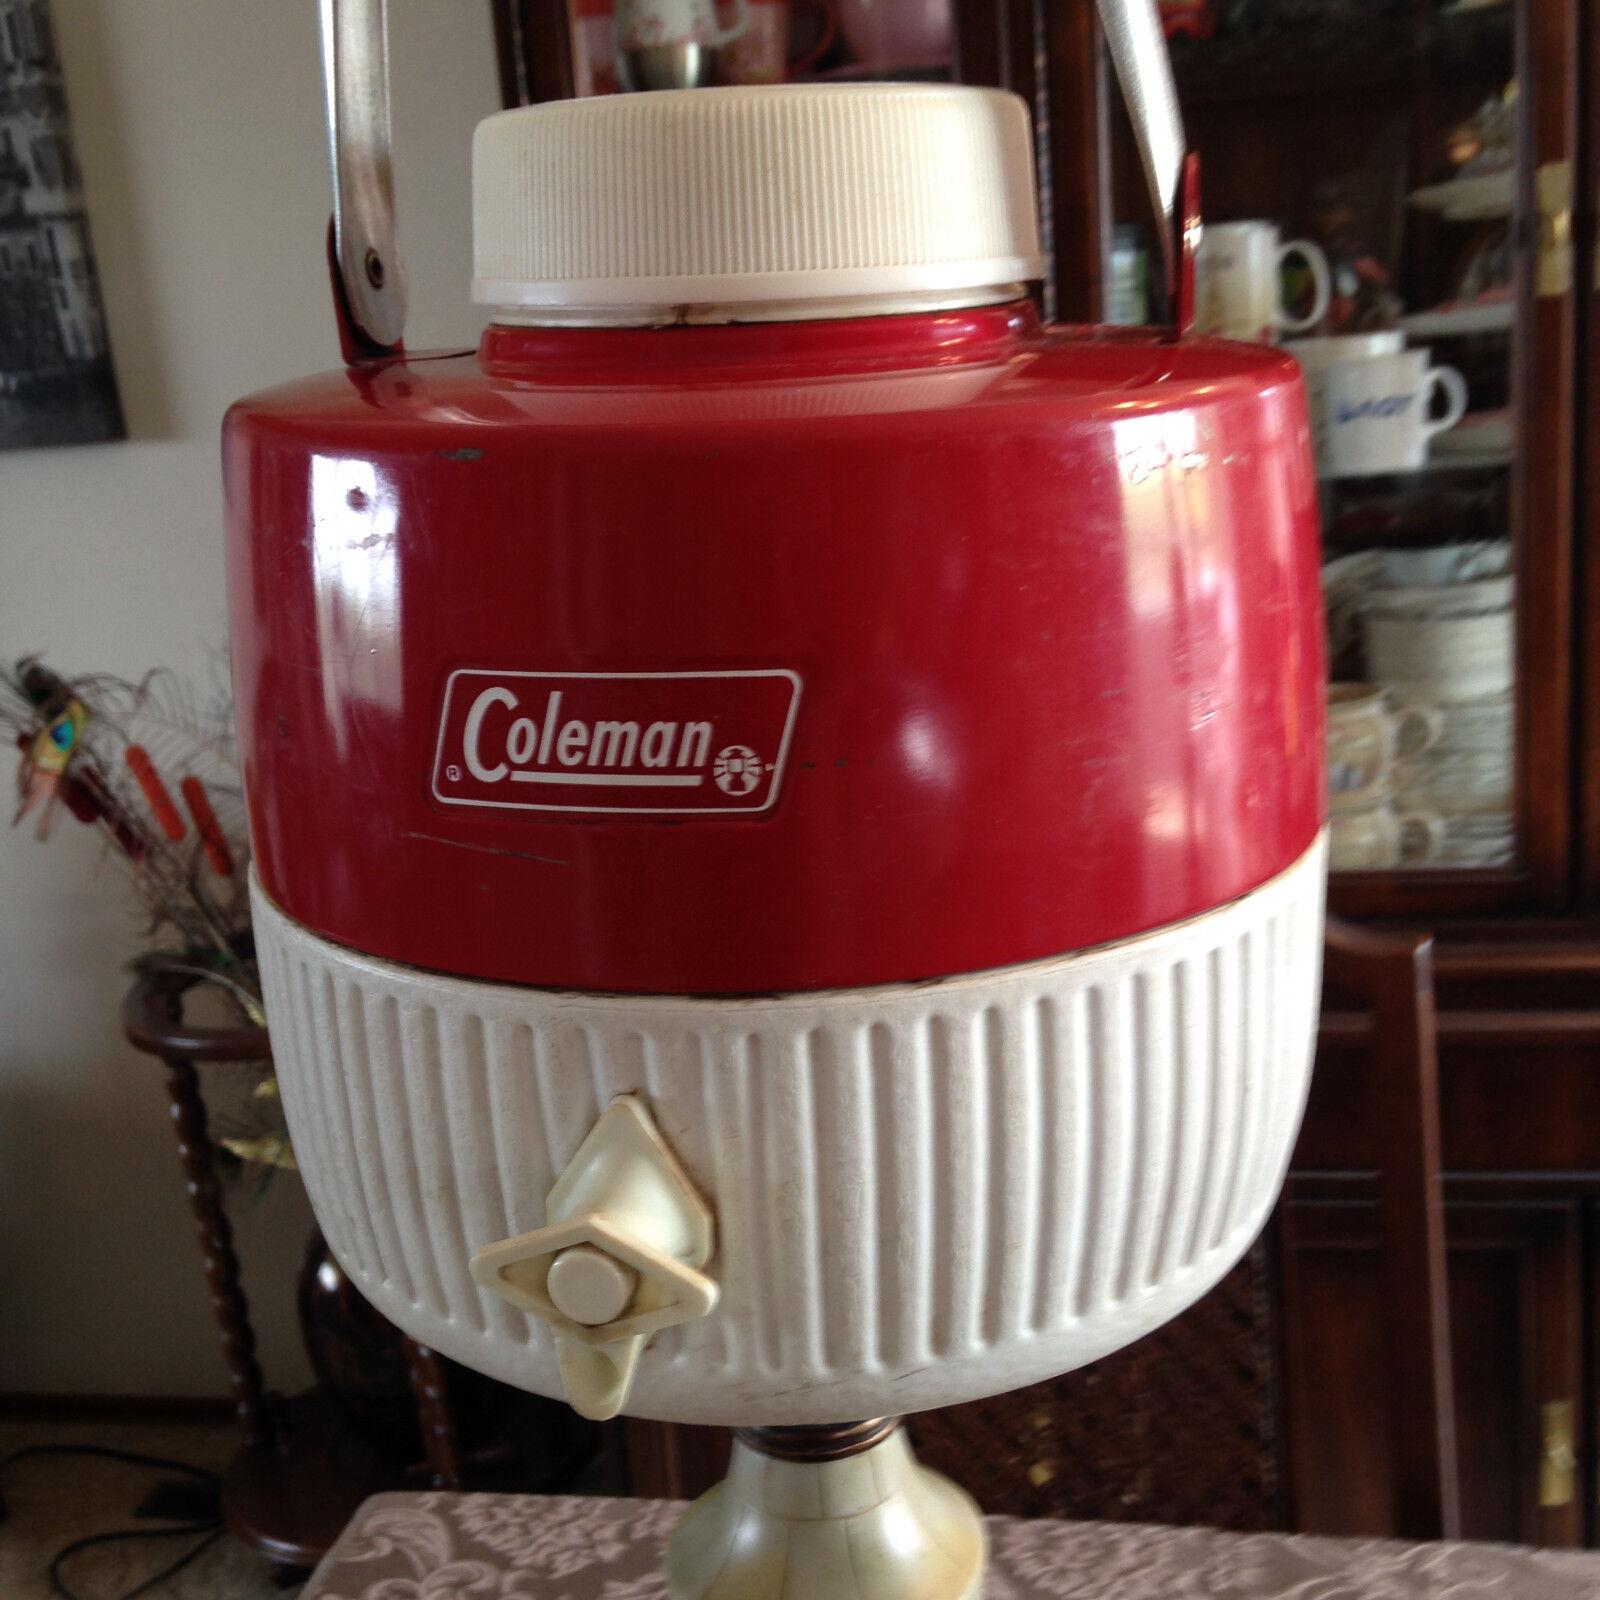 Vintage Water Jug Red Metal Cooler Coleman with Original Box SNOW-LITE Jug